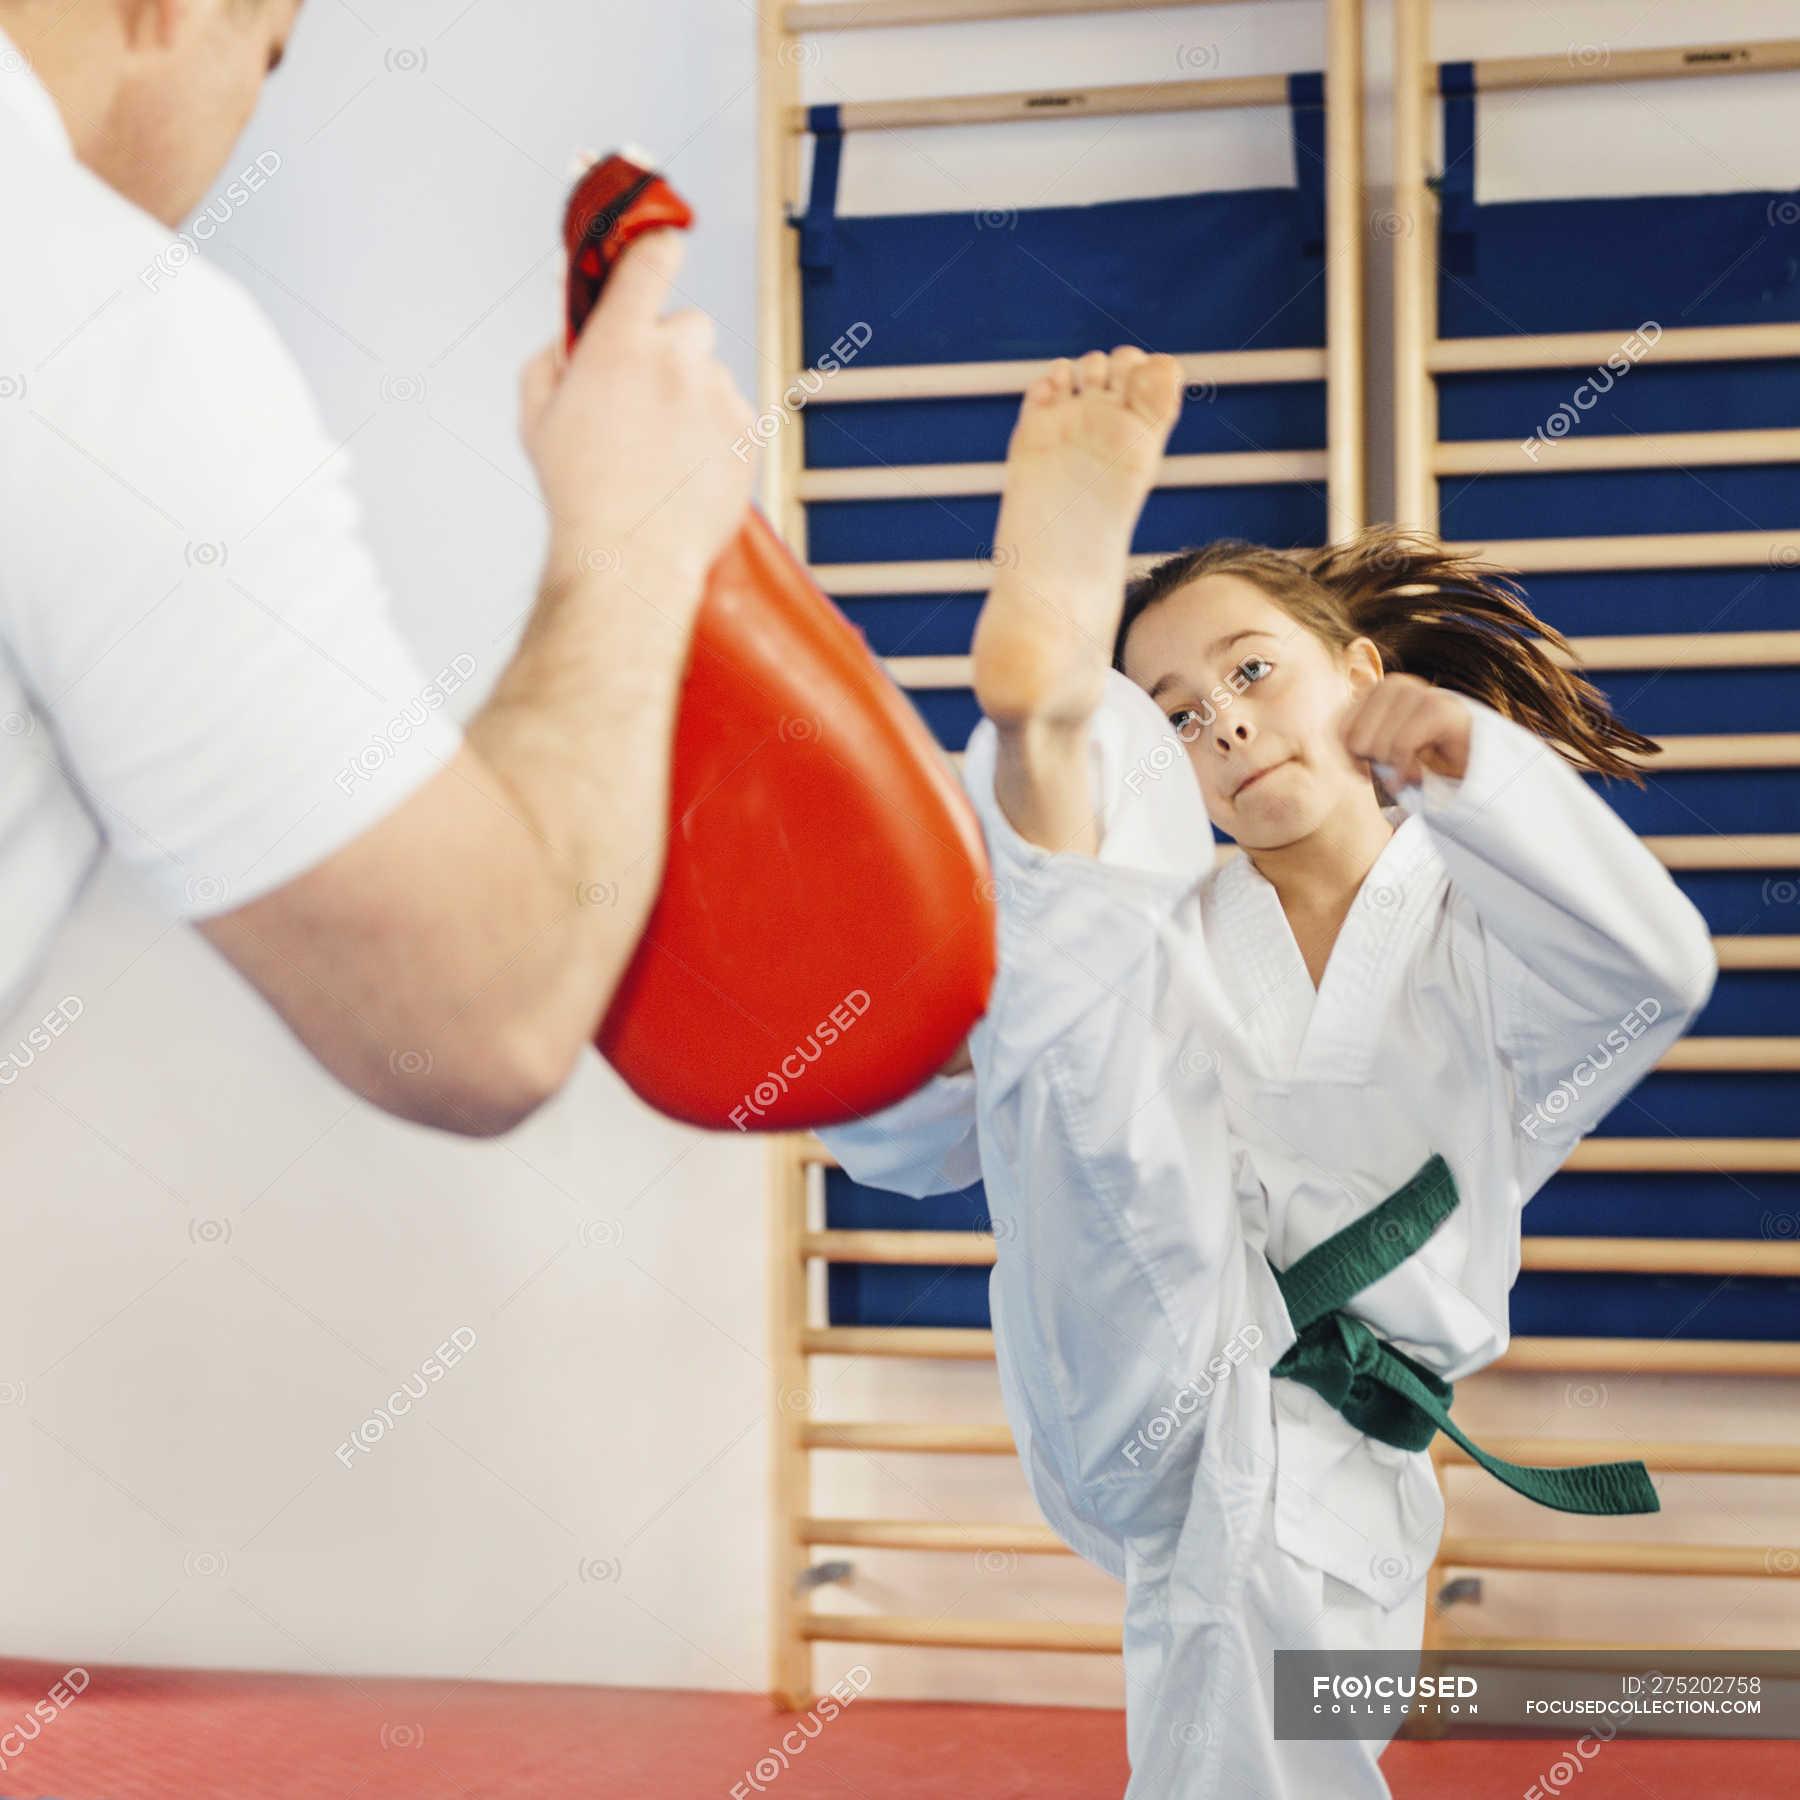 Girl kicking punch bag in taekwondo class with trainer